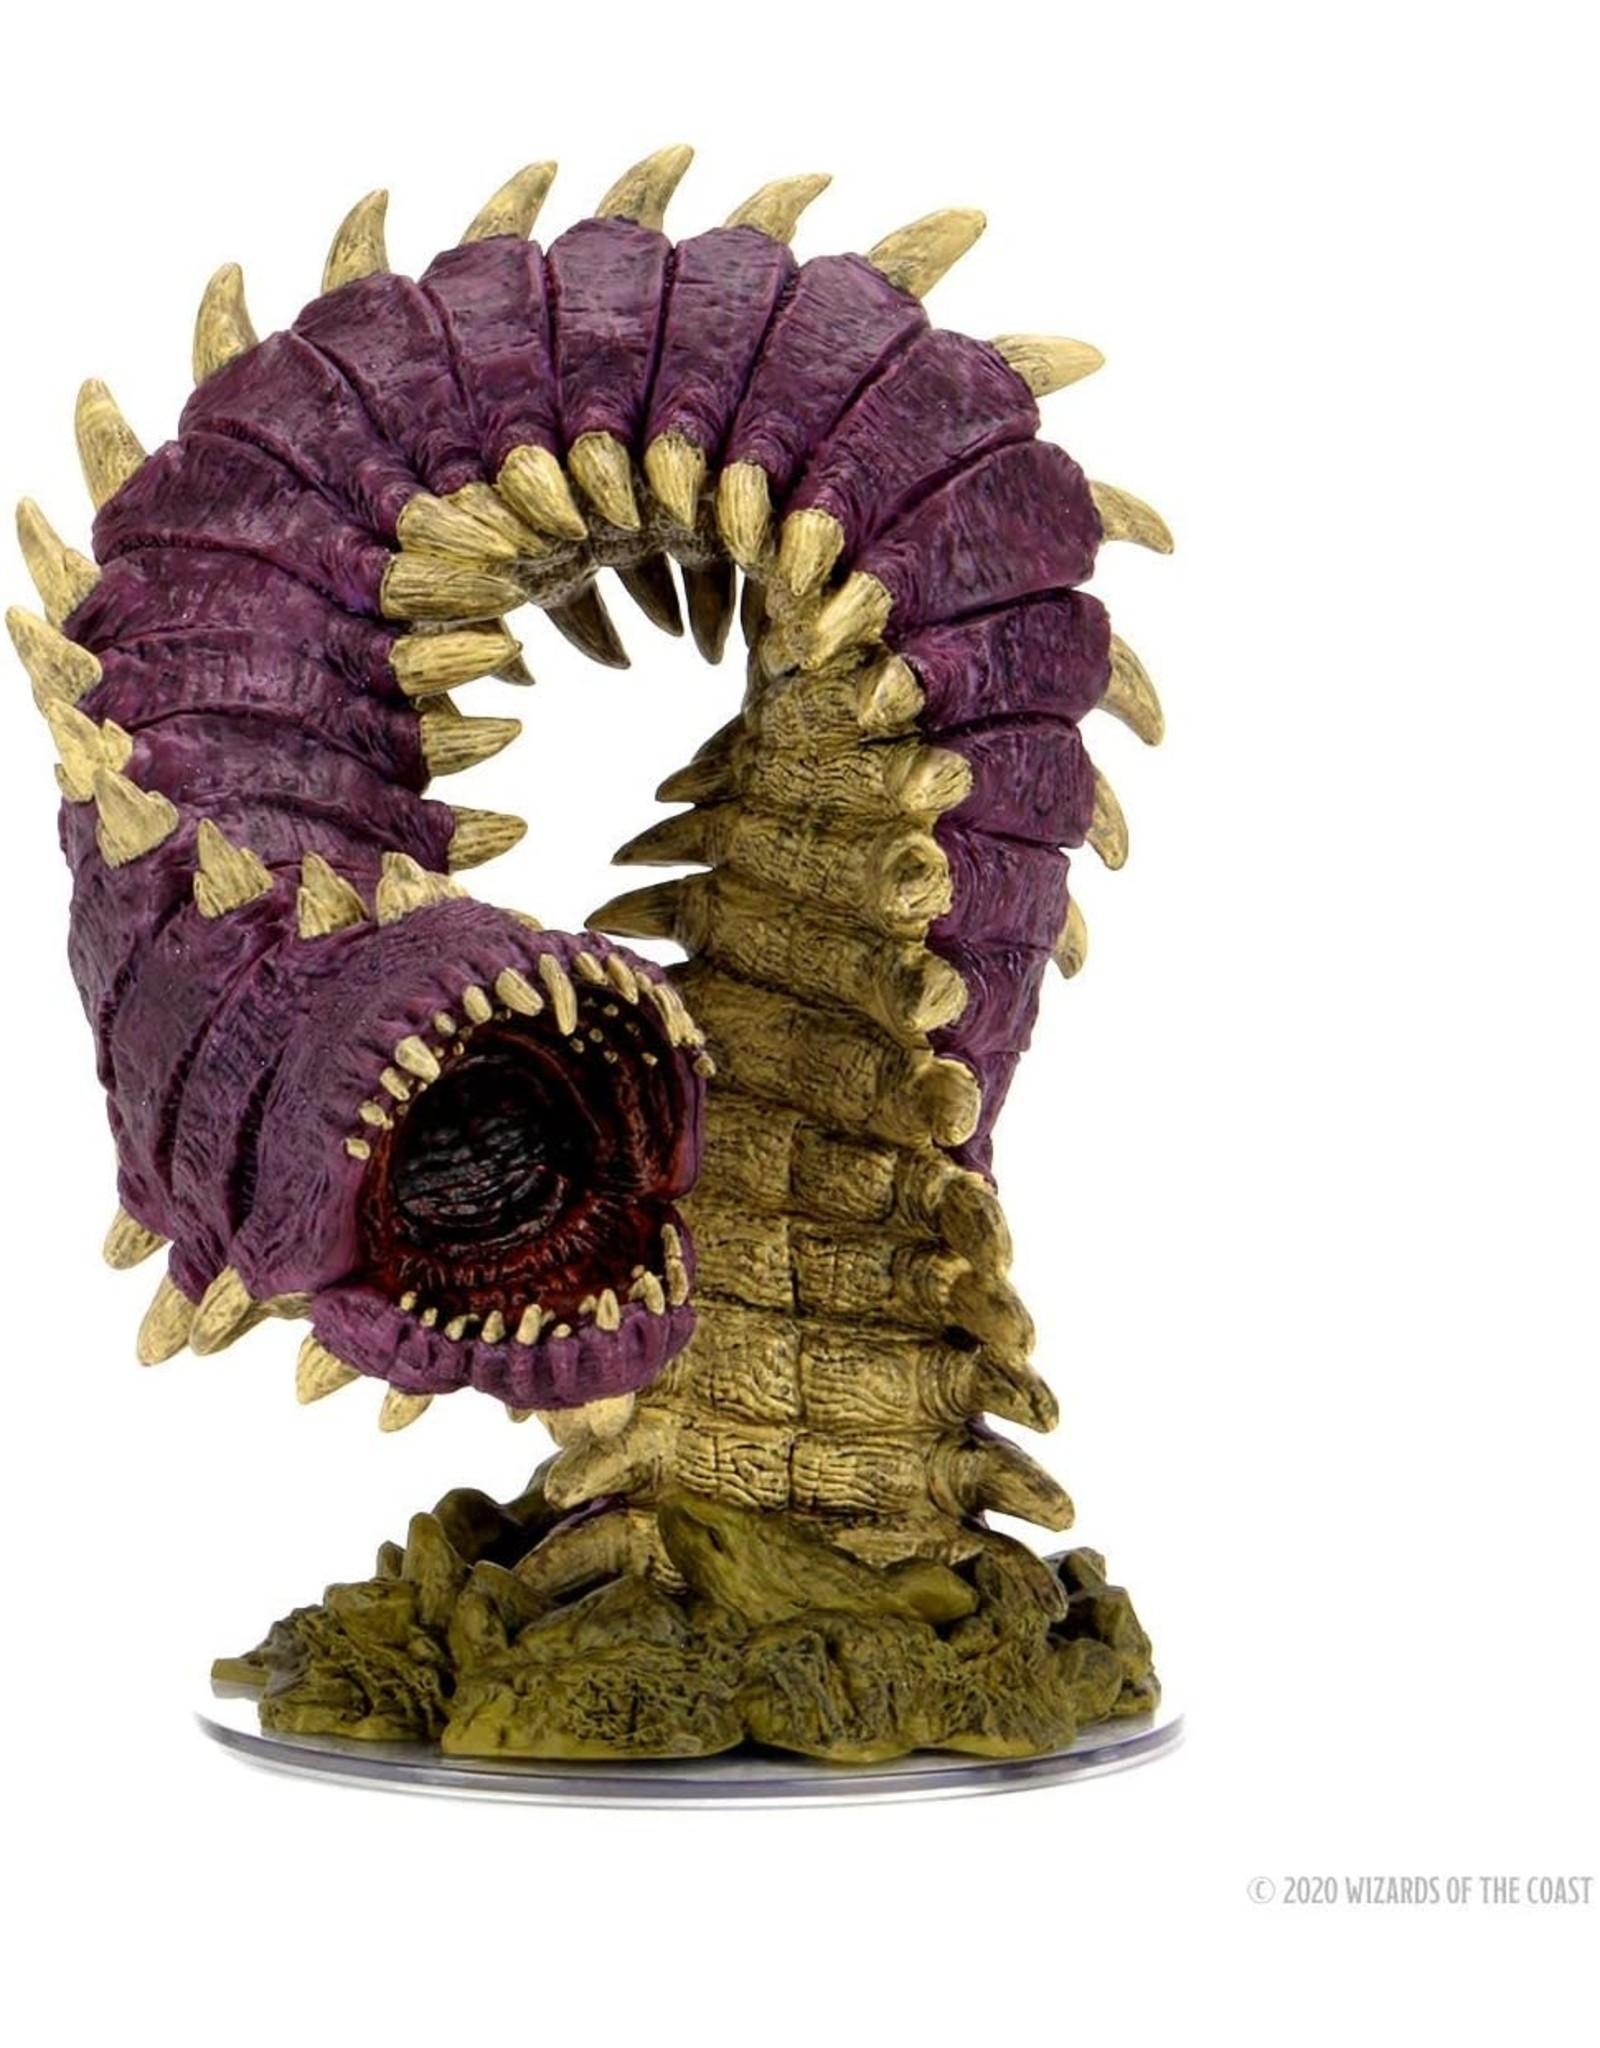 Wizkids D&D Minis: Icons of the Realms set 15 - Purple Worm